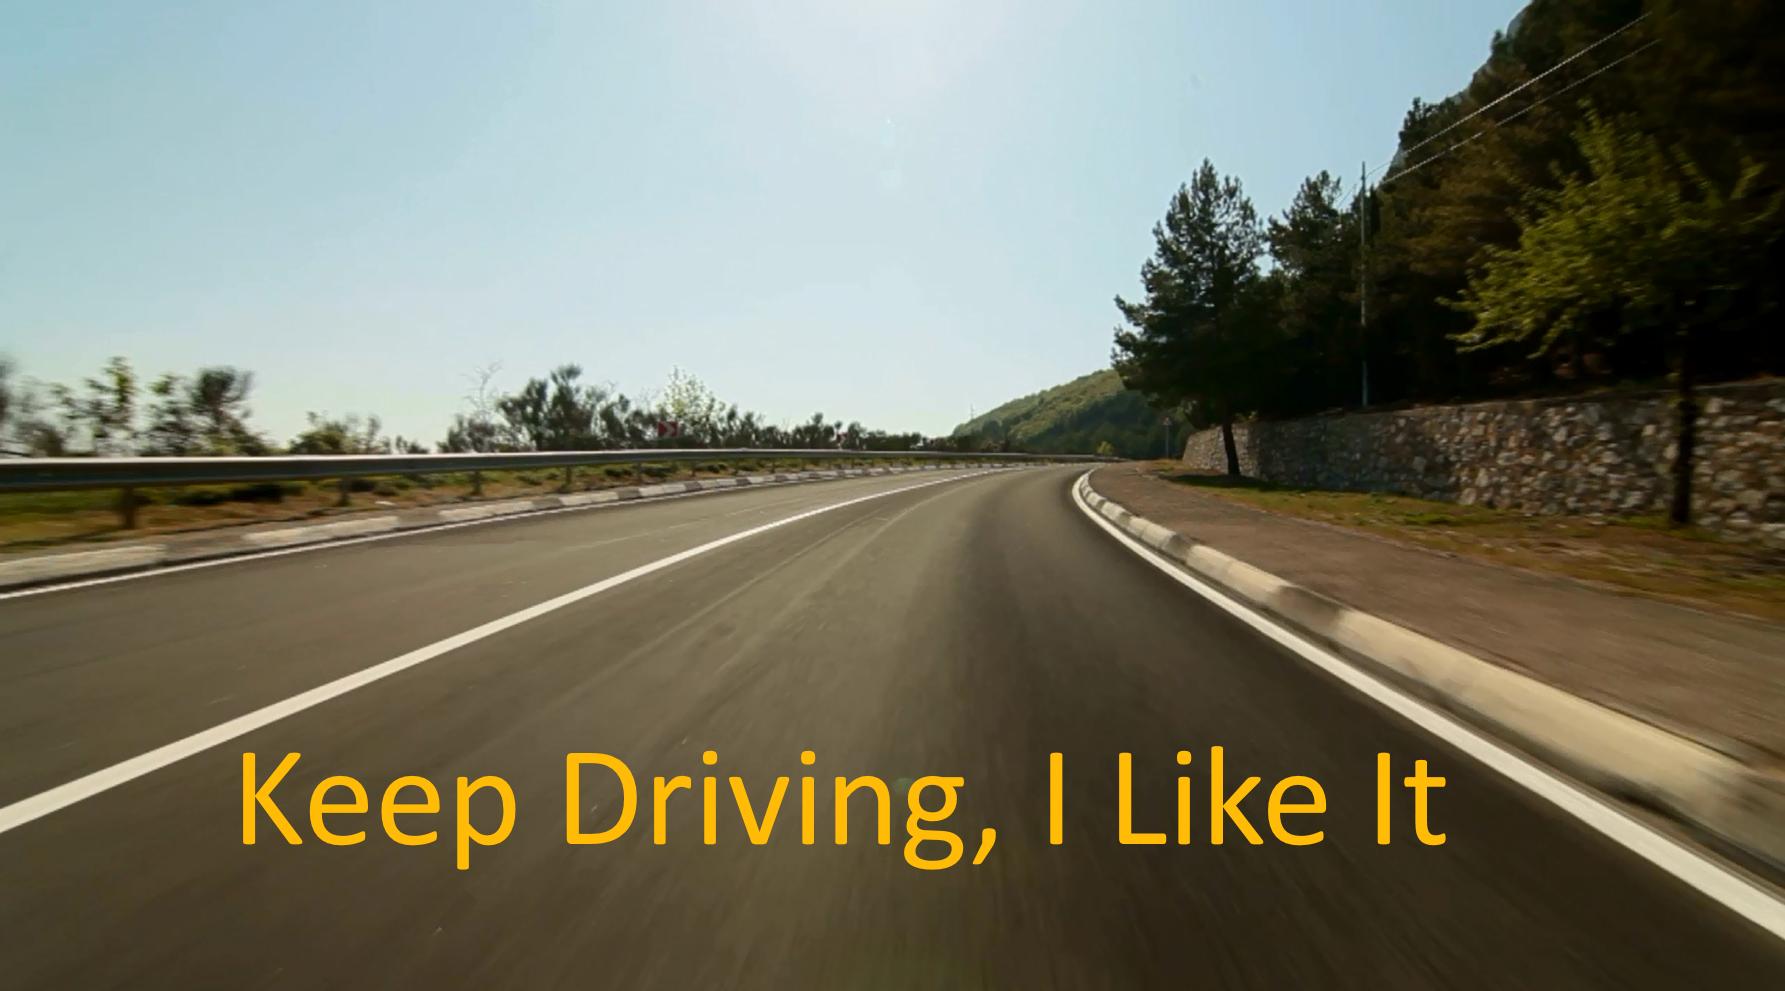 keep driving